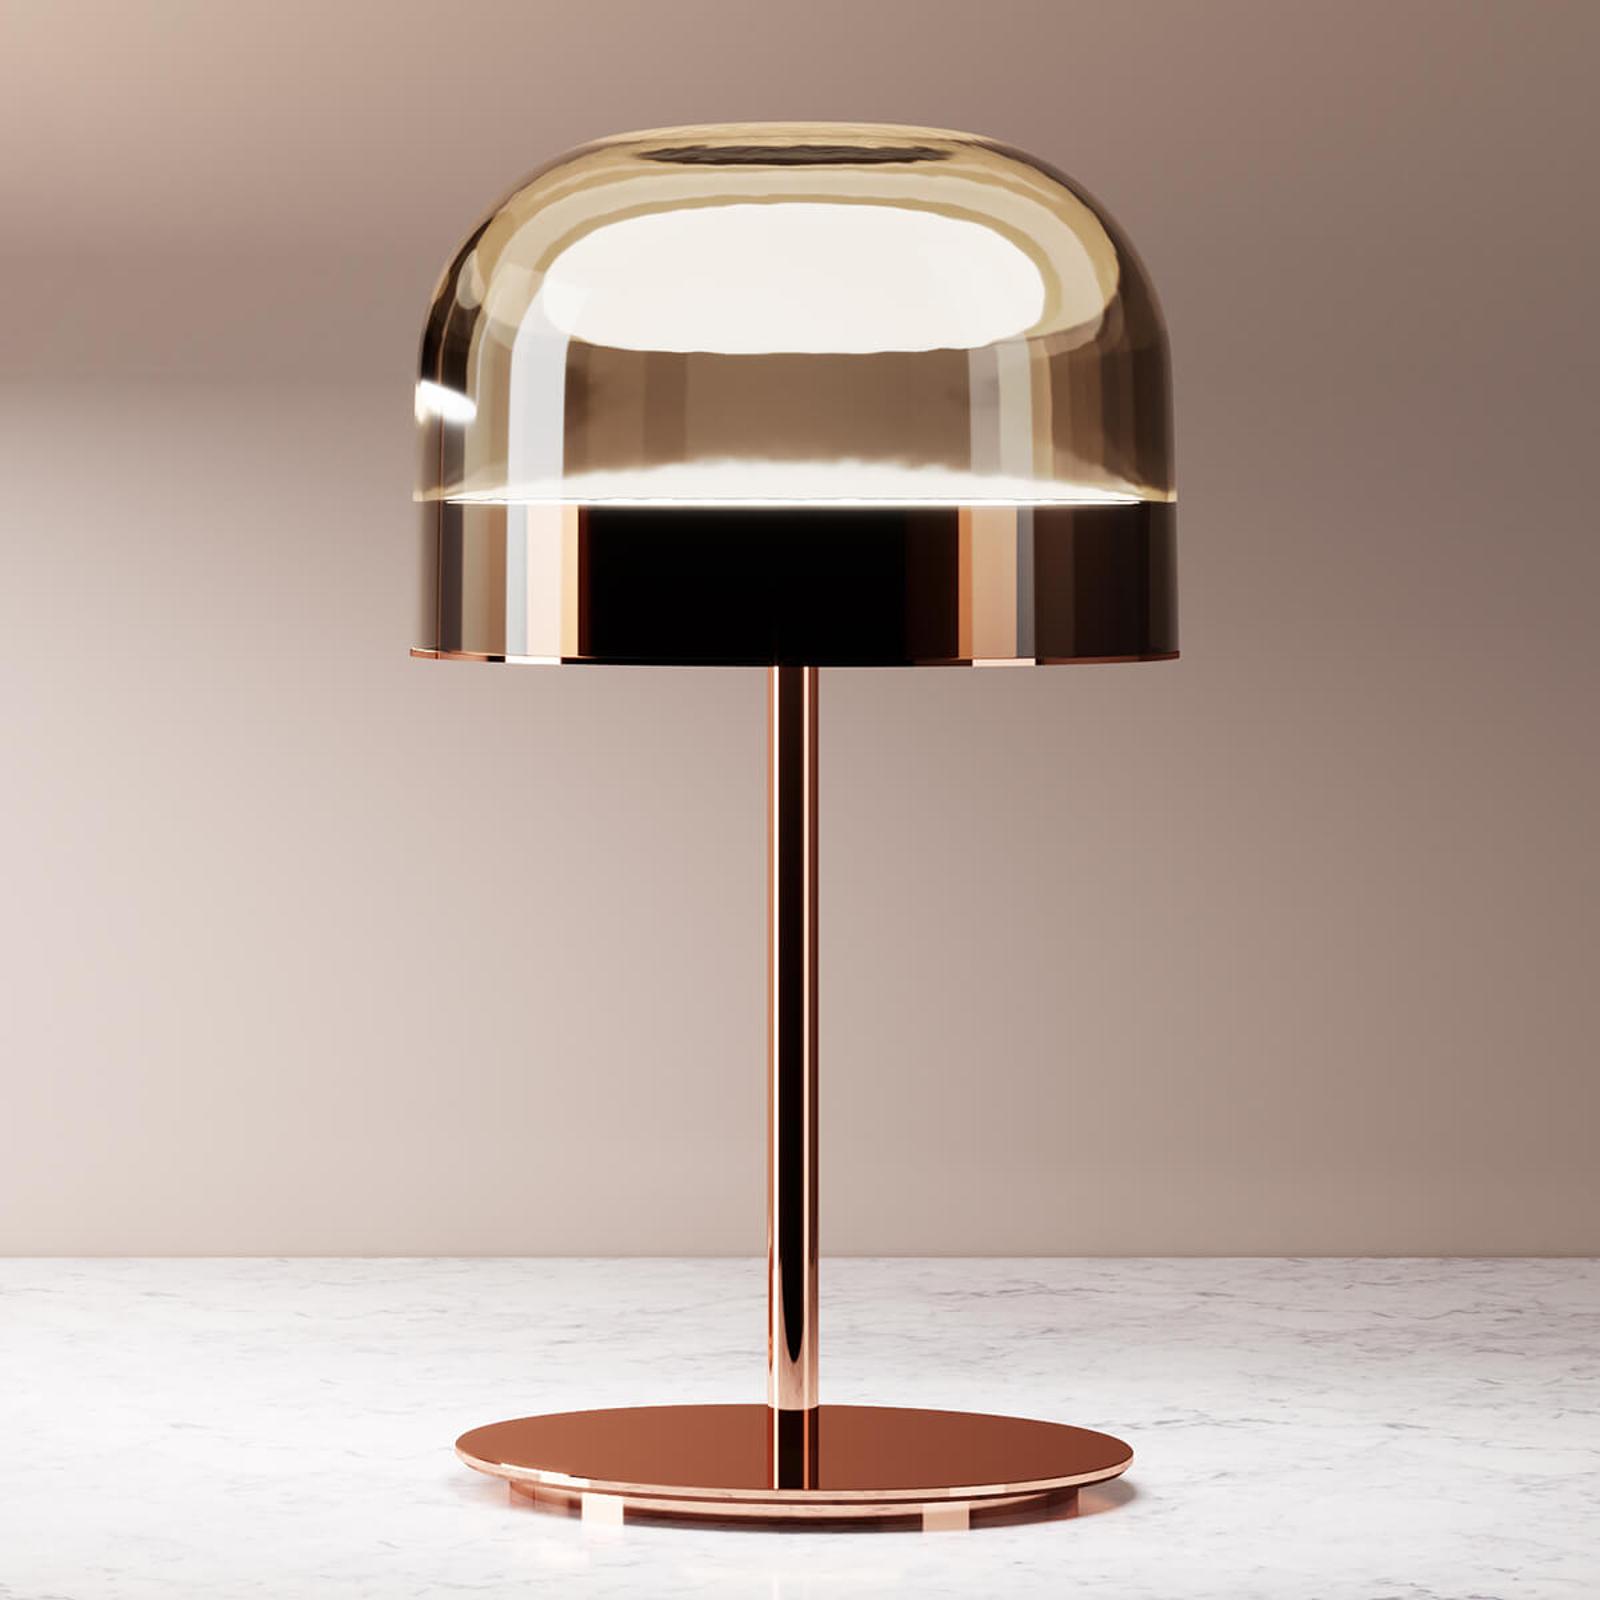 Equatore – lampa stołowa LED w miedzi, 42,5 cm